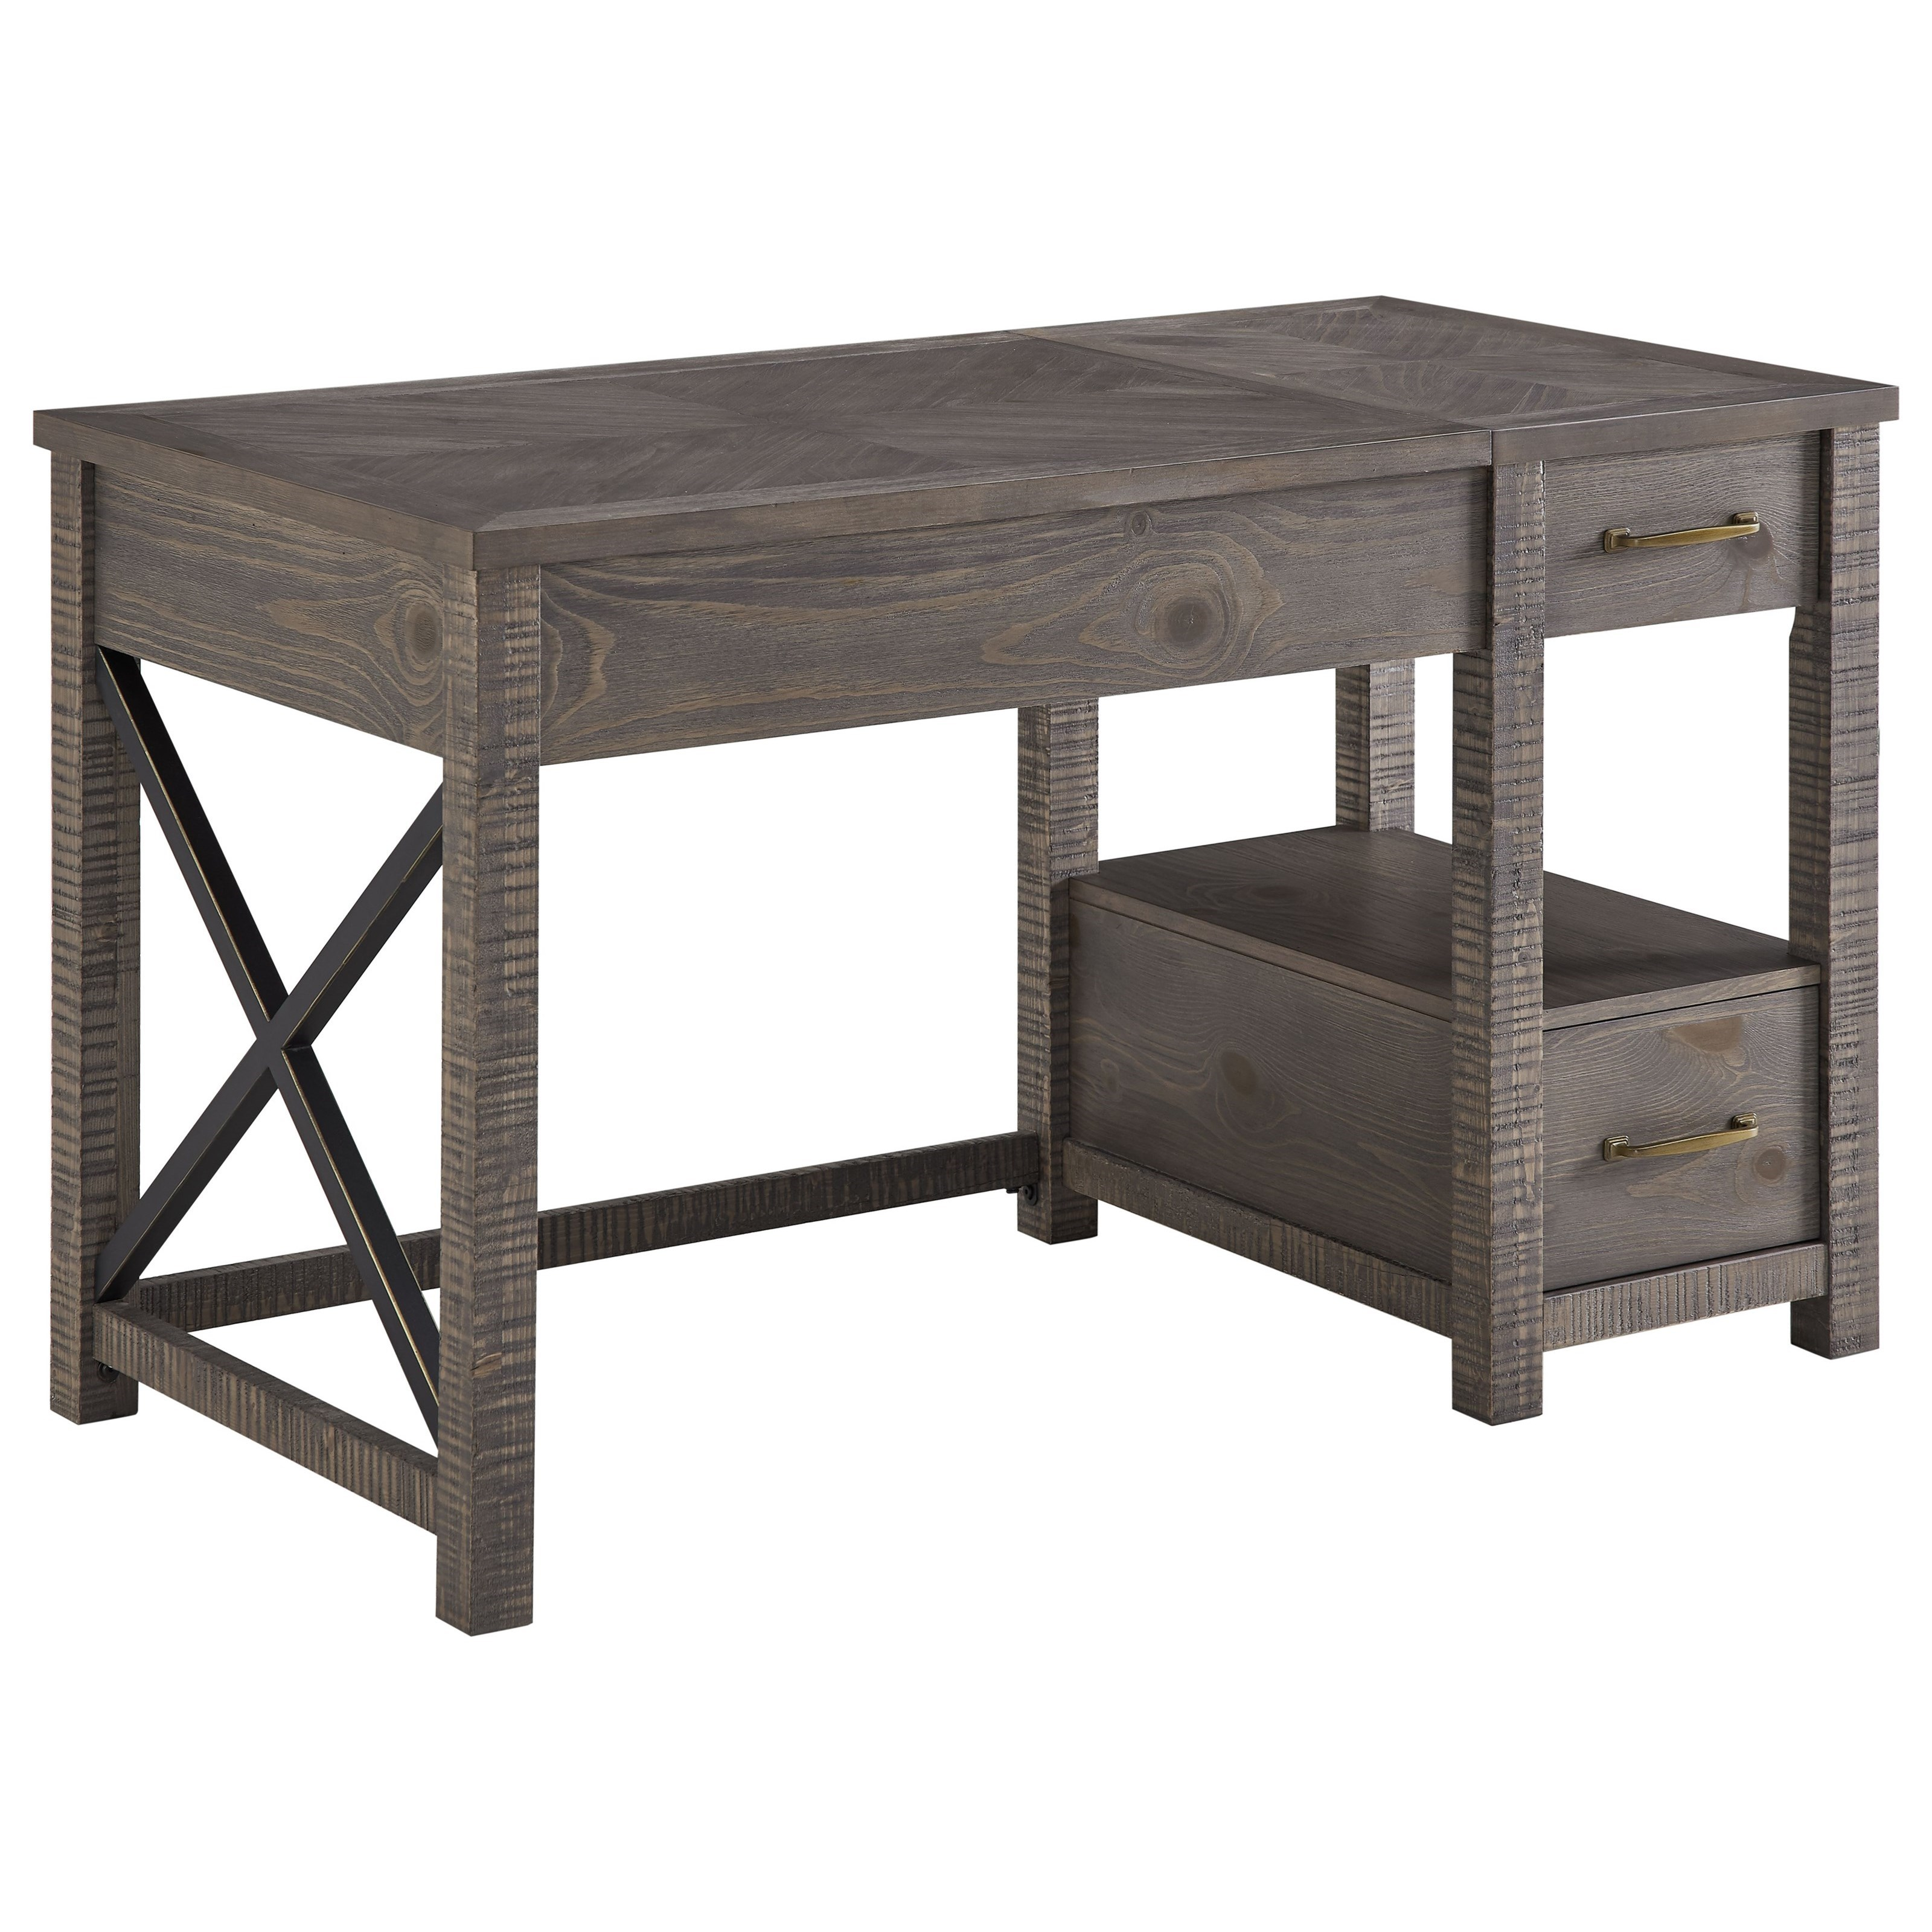 Dexter Lift-Top Desk by Steve Silver at Walker's Furniture